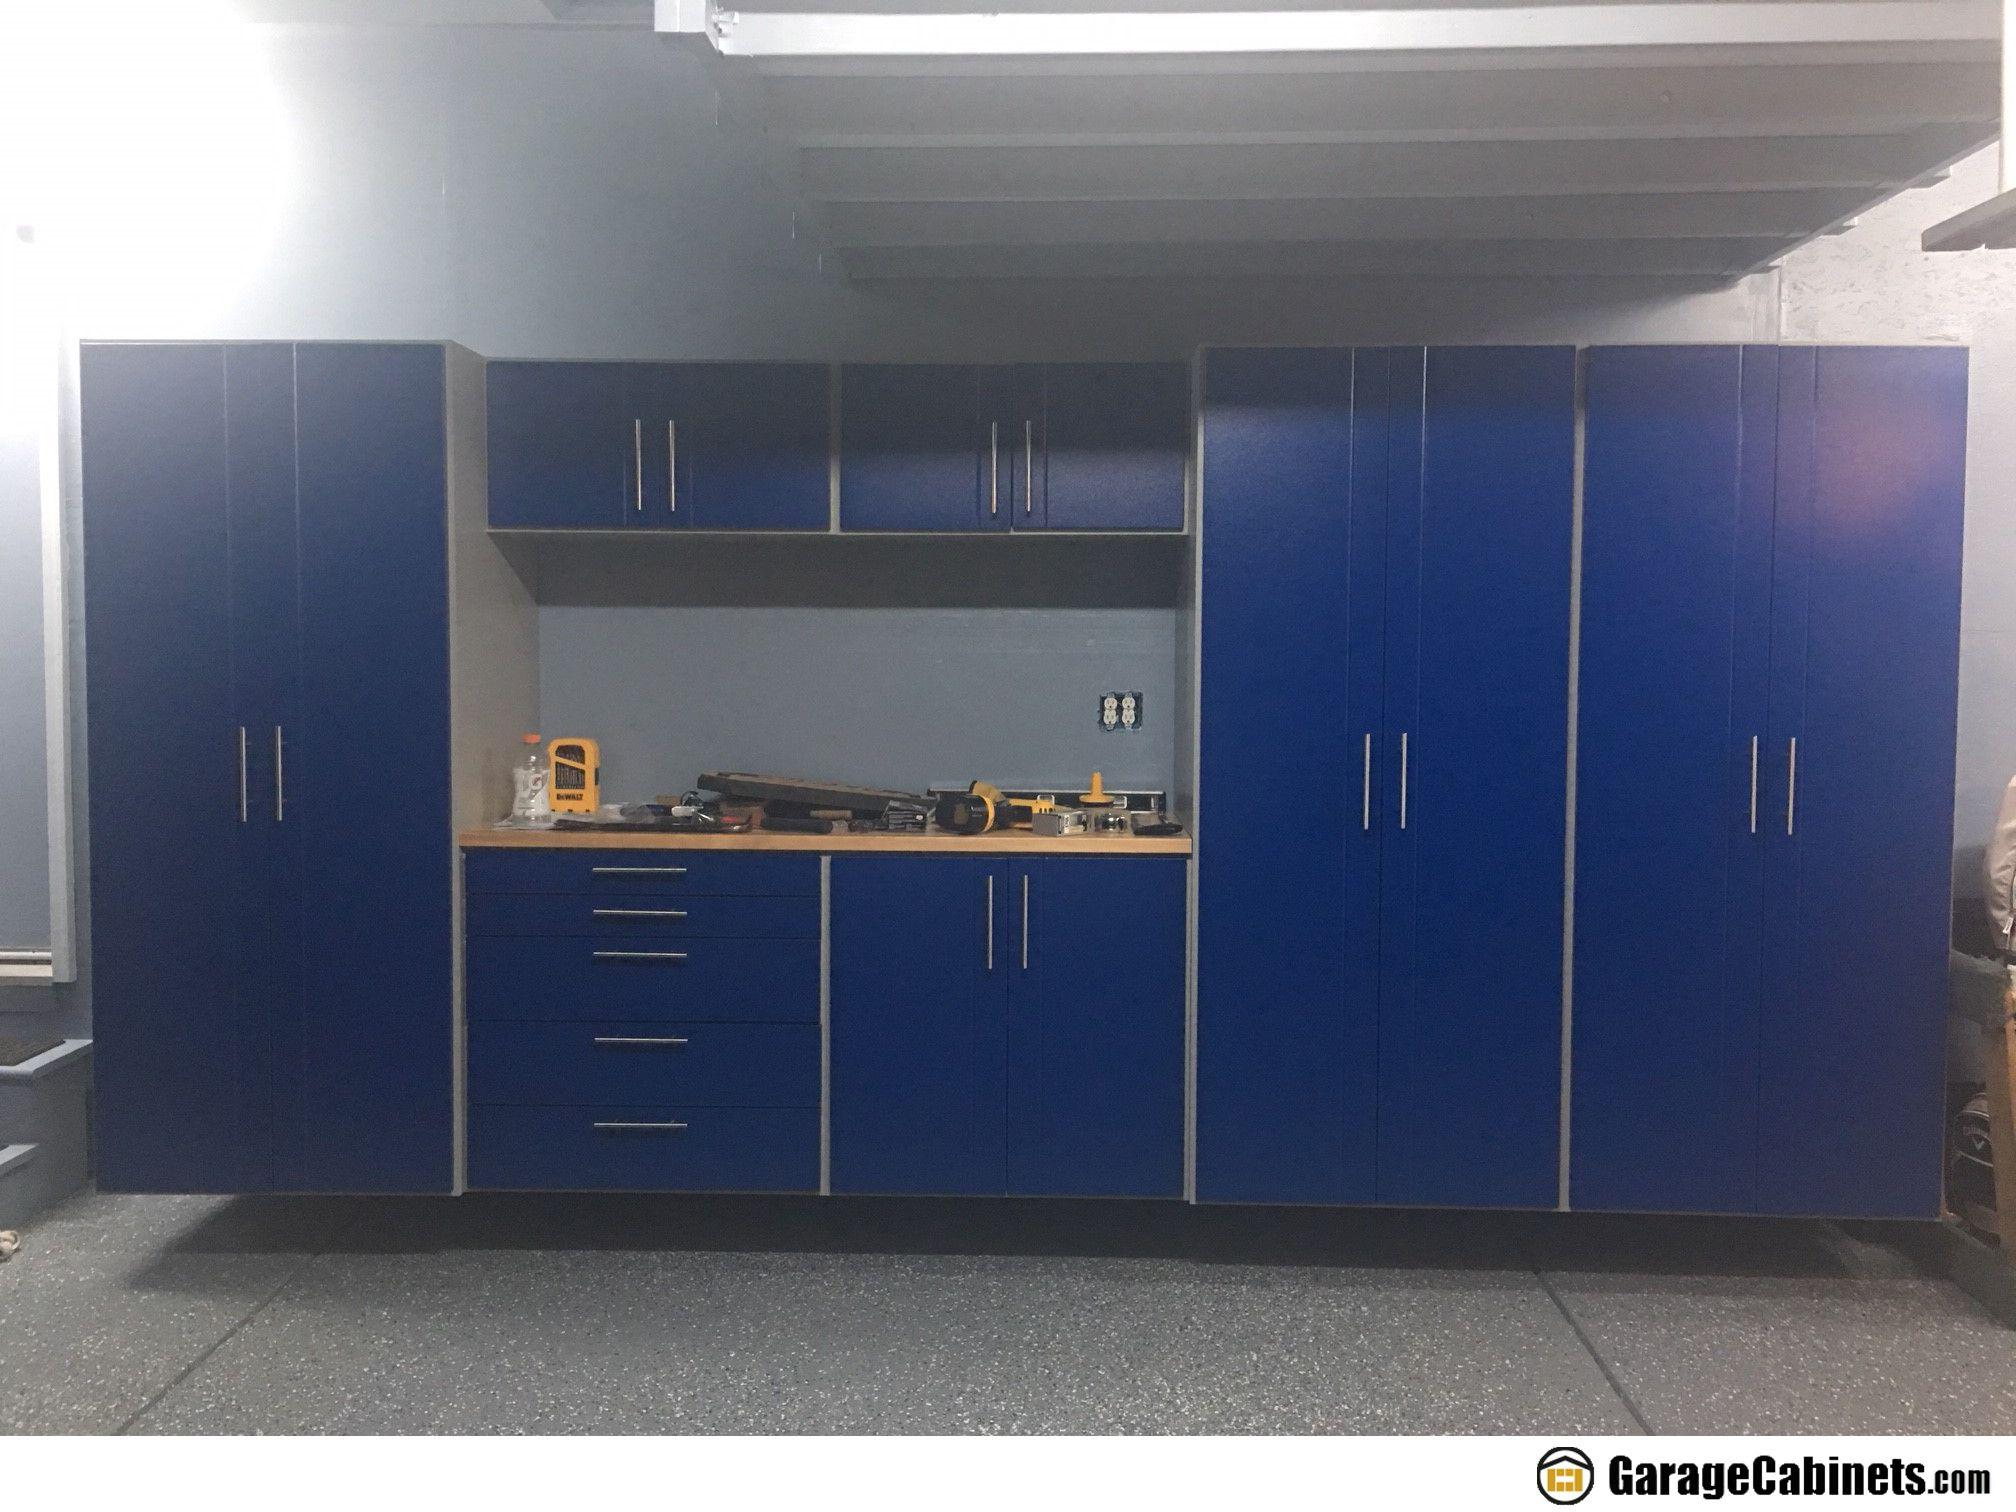 Garagecabinets Com Manufactures The Finest Blue Garage Storage